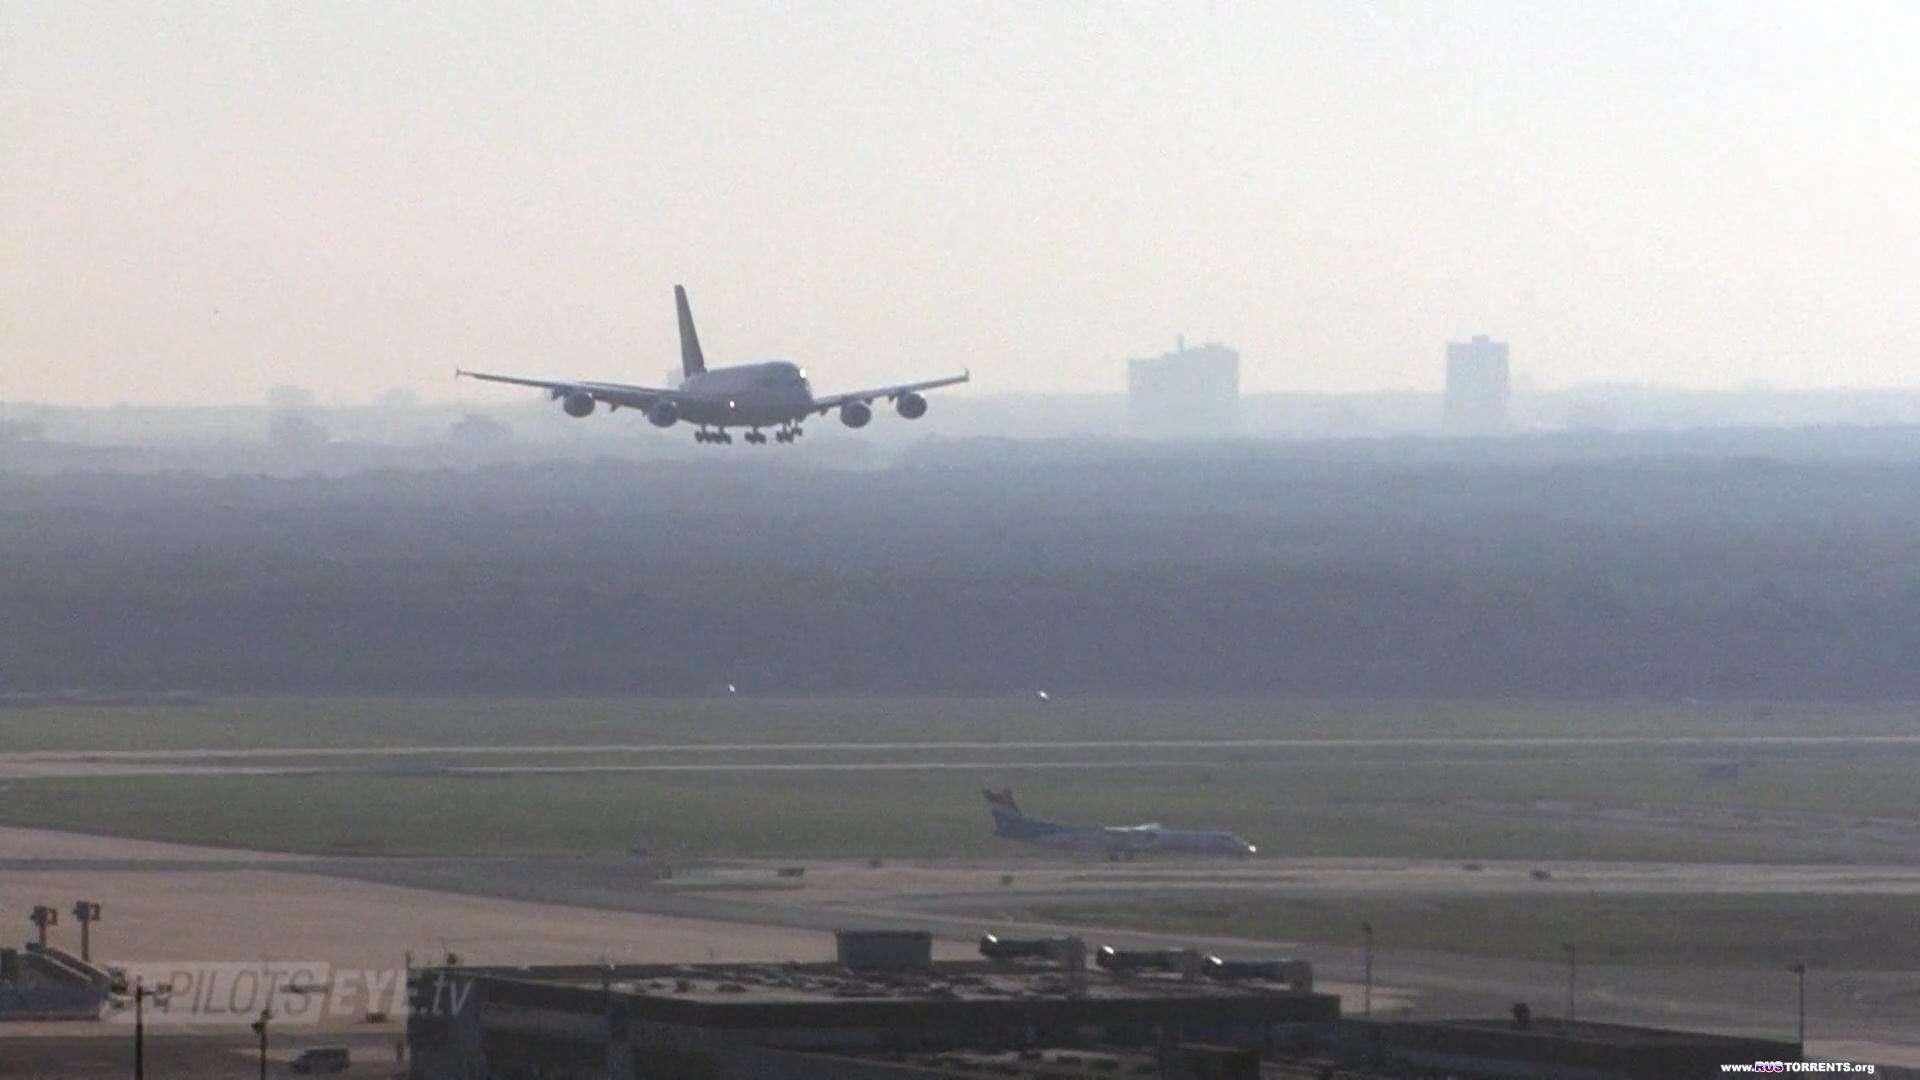 Глазами пилота. Франкфурт - Сан-Франциско с А380